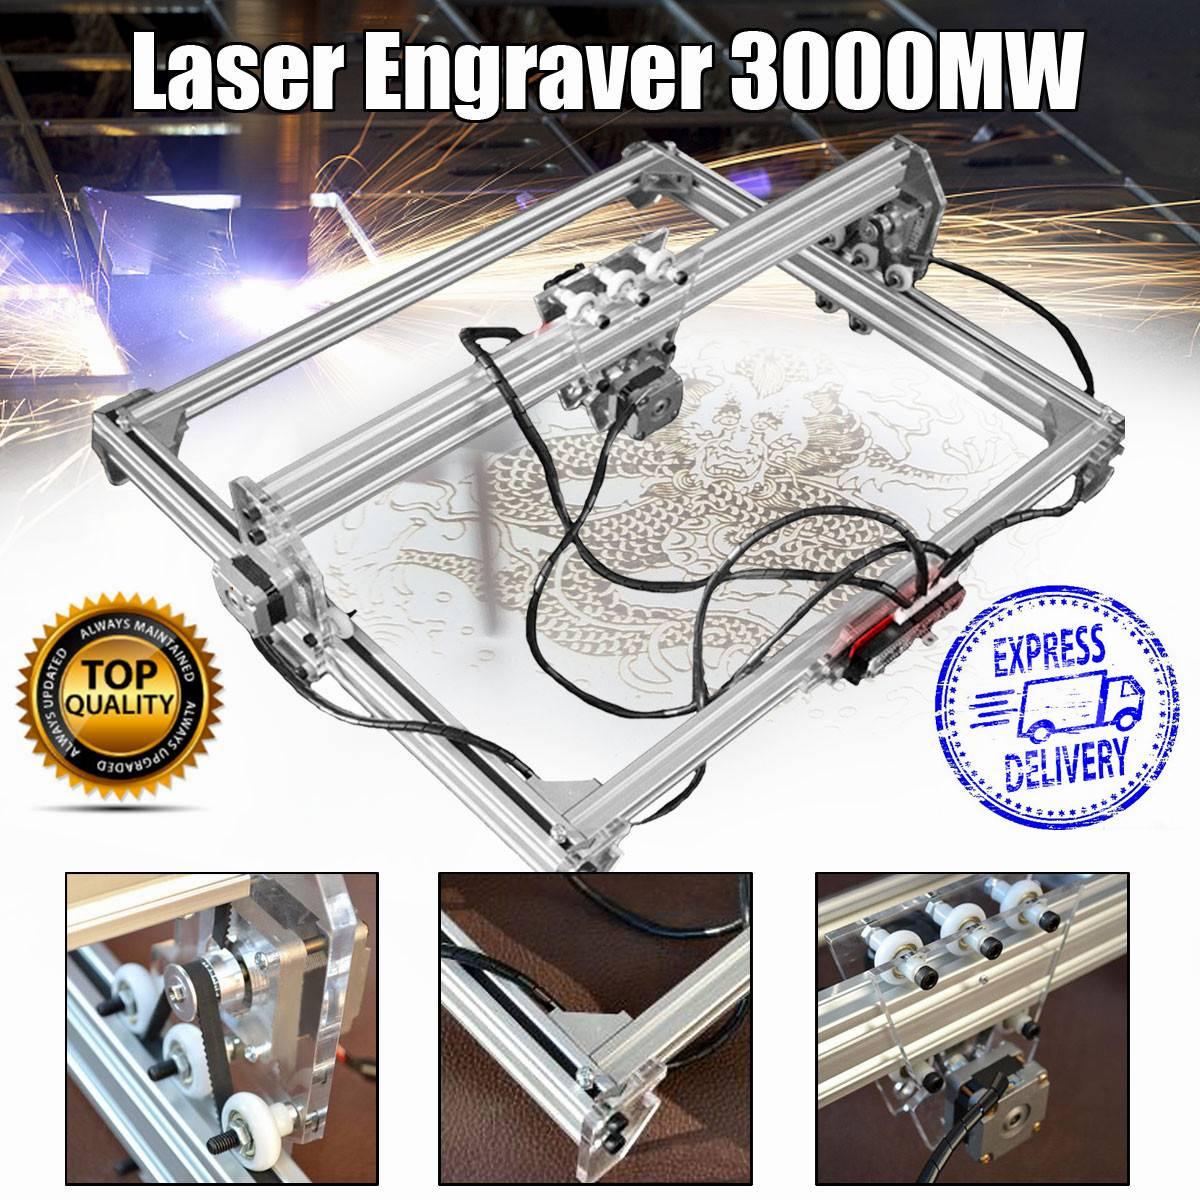 15 w/3000 mw 50*65cm cnc laser gravador máquina de gravura para metal/madeira roteador/diy cortador 2 eixos gravador desktop cortador + laser